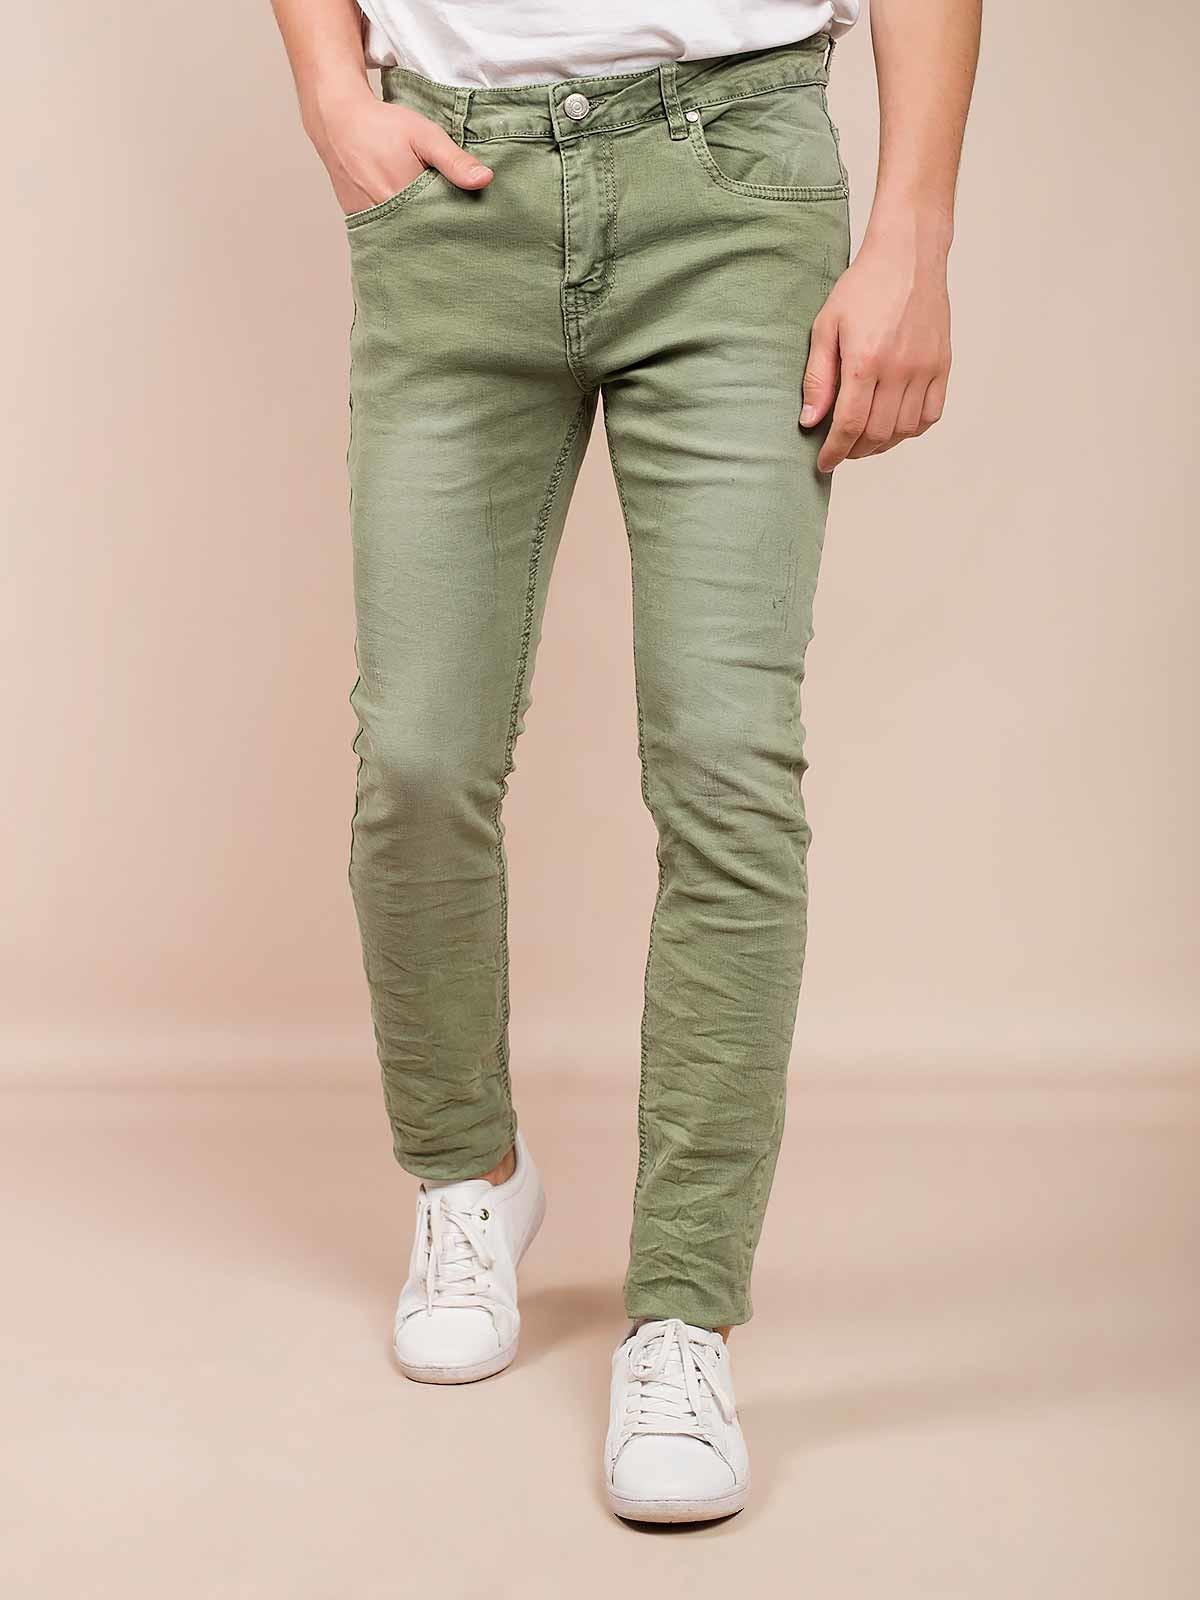 Pantalones de sarga manchados